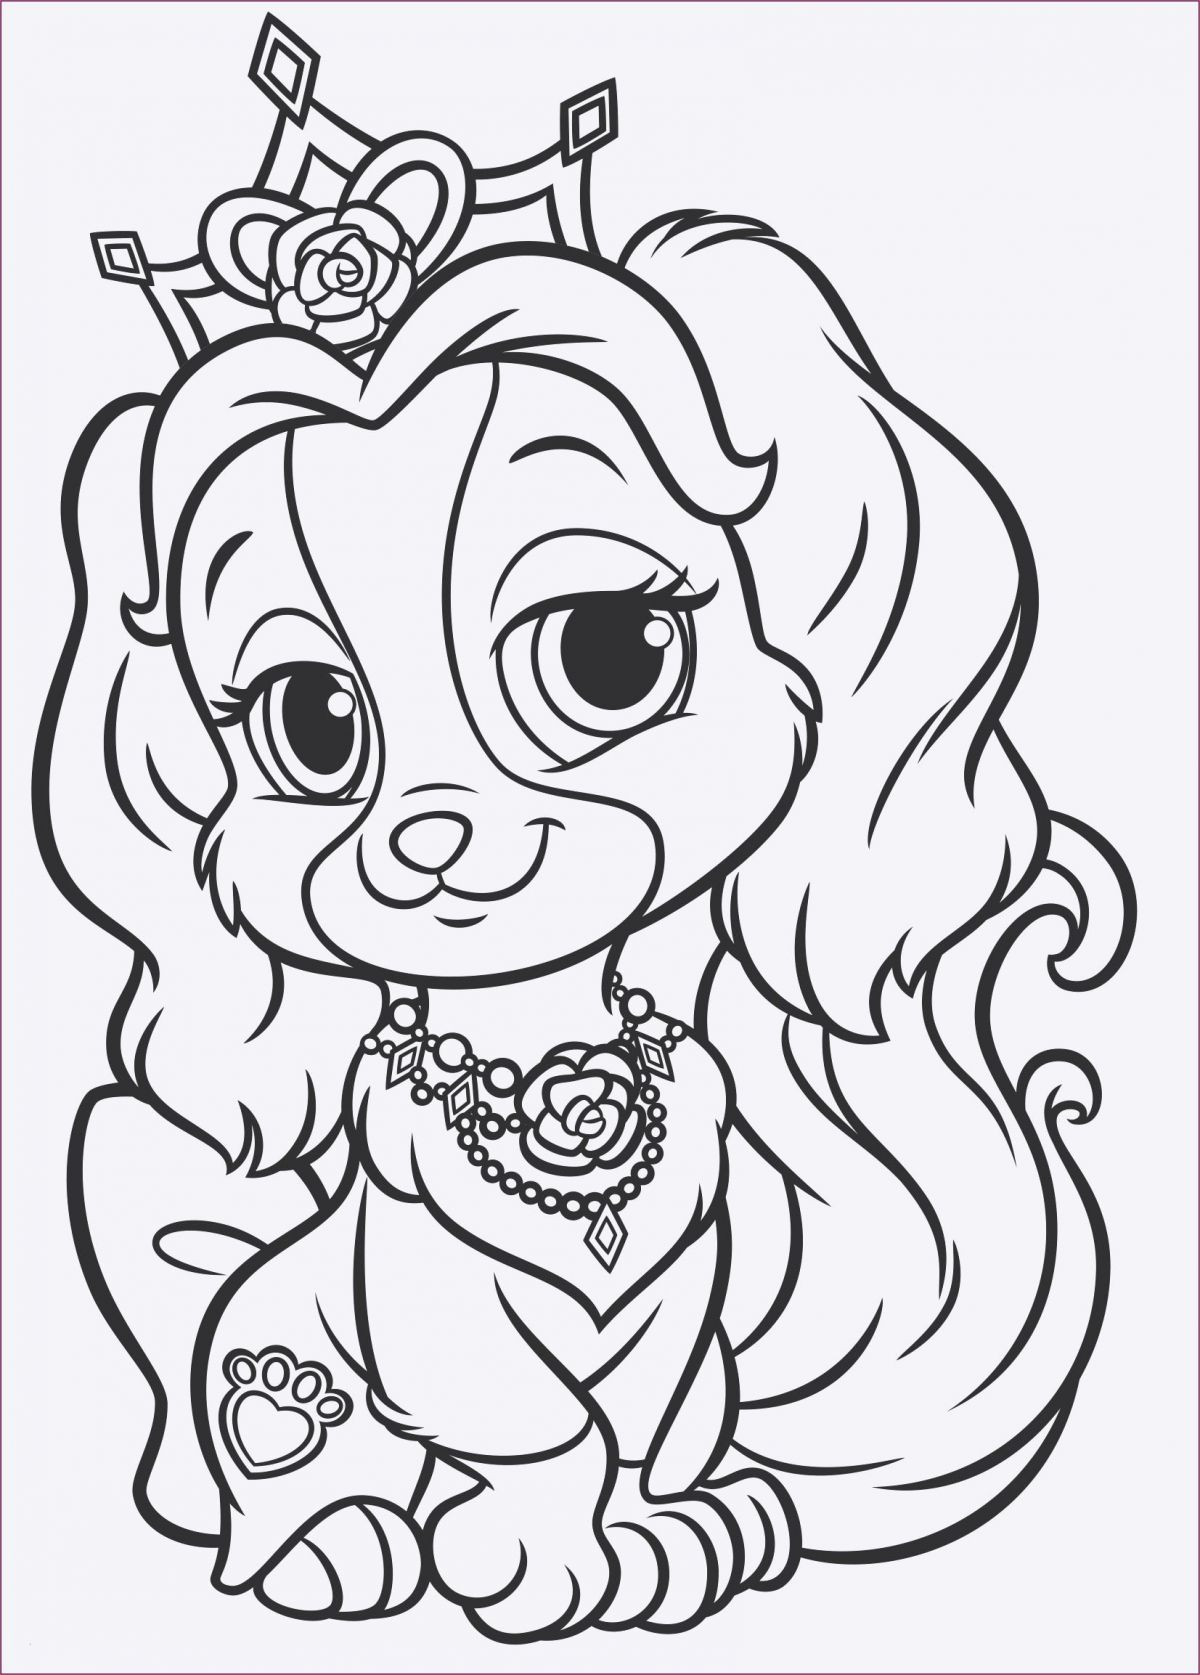 Ausmalbilder Disney Prinzessin Jasmin Inspirierend Ausmalbilder Disney Prinzessinnen Ariel Elegant Malvorlagen Gratis Stock